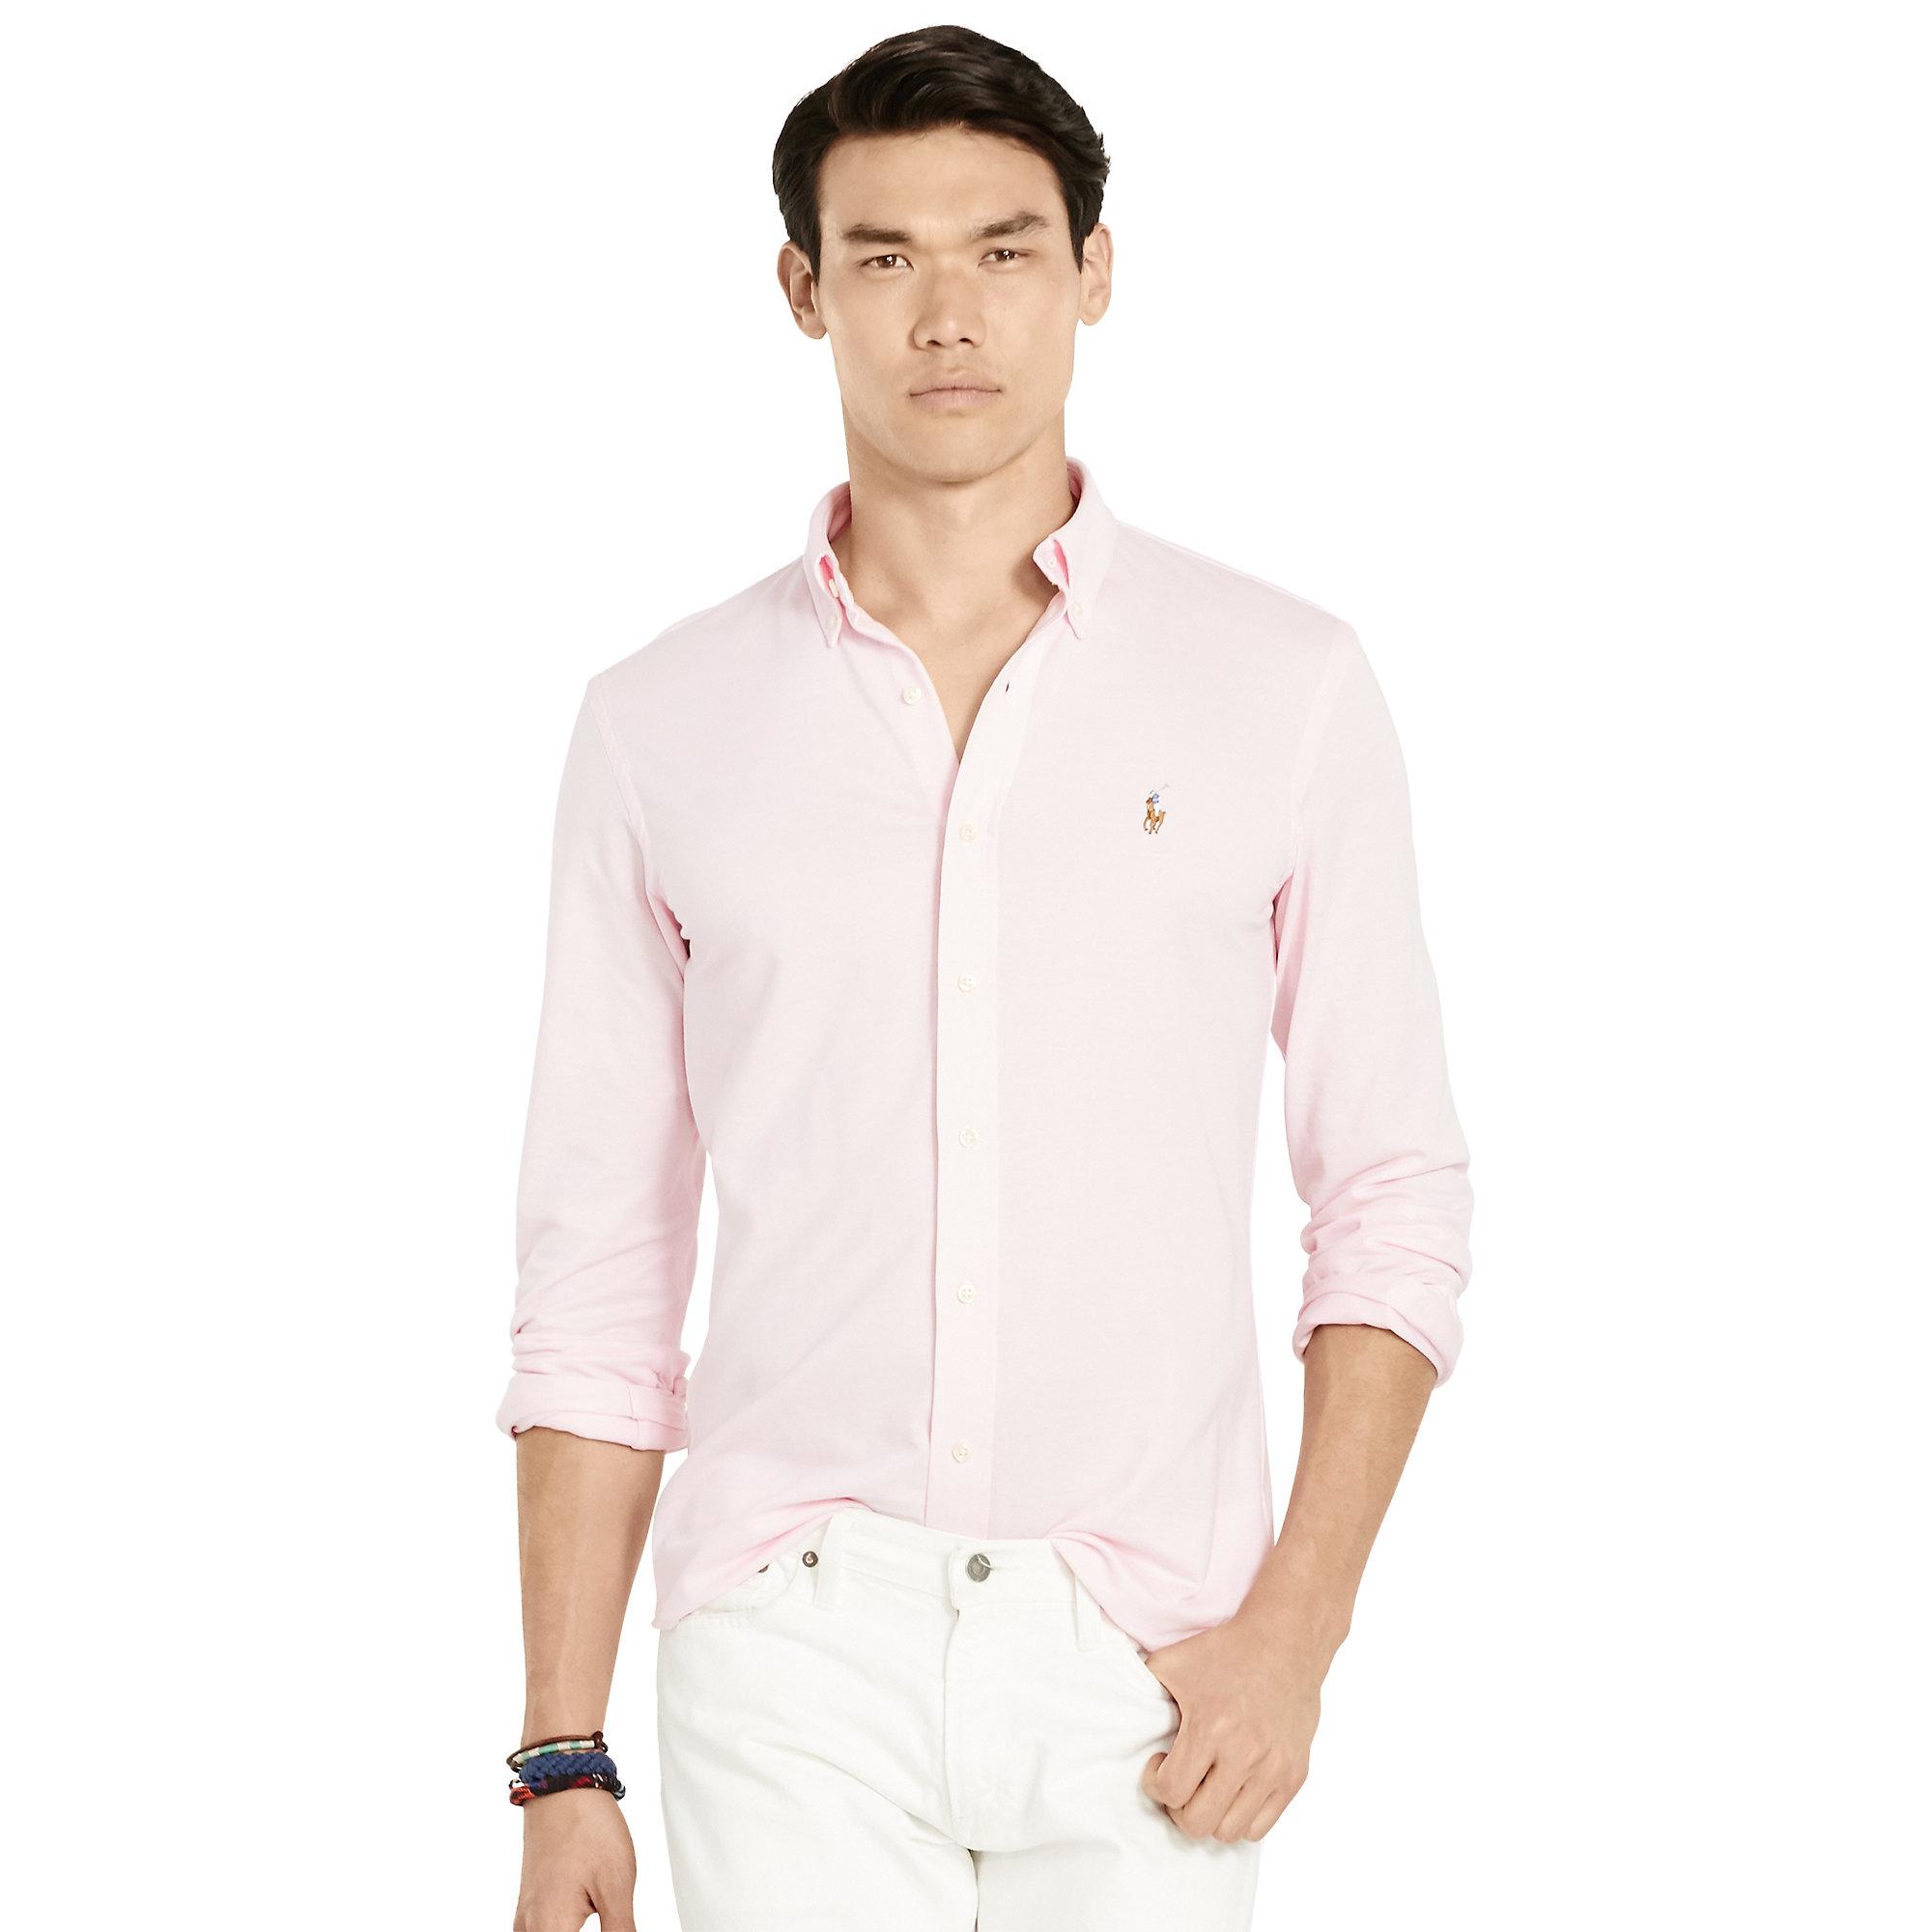 70654735d508af Polo Ralph Lauren Slim-fit Knit Oxford in Pink for Men - Lyst